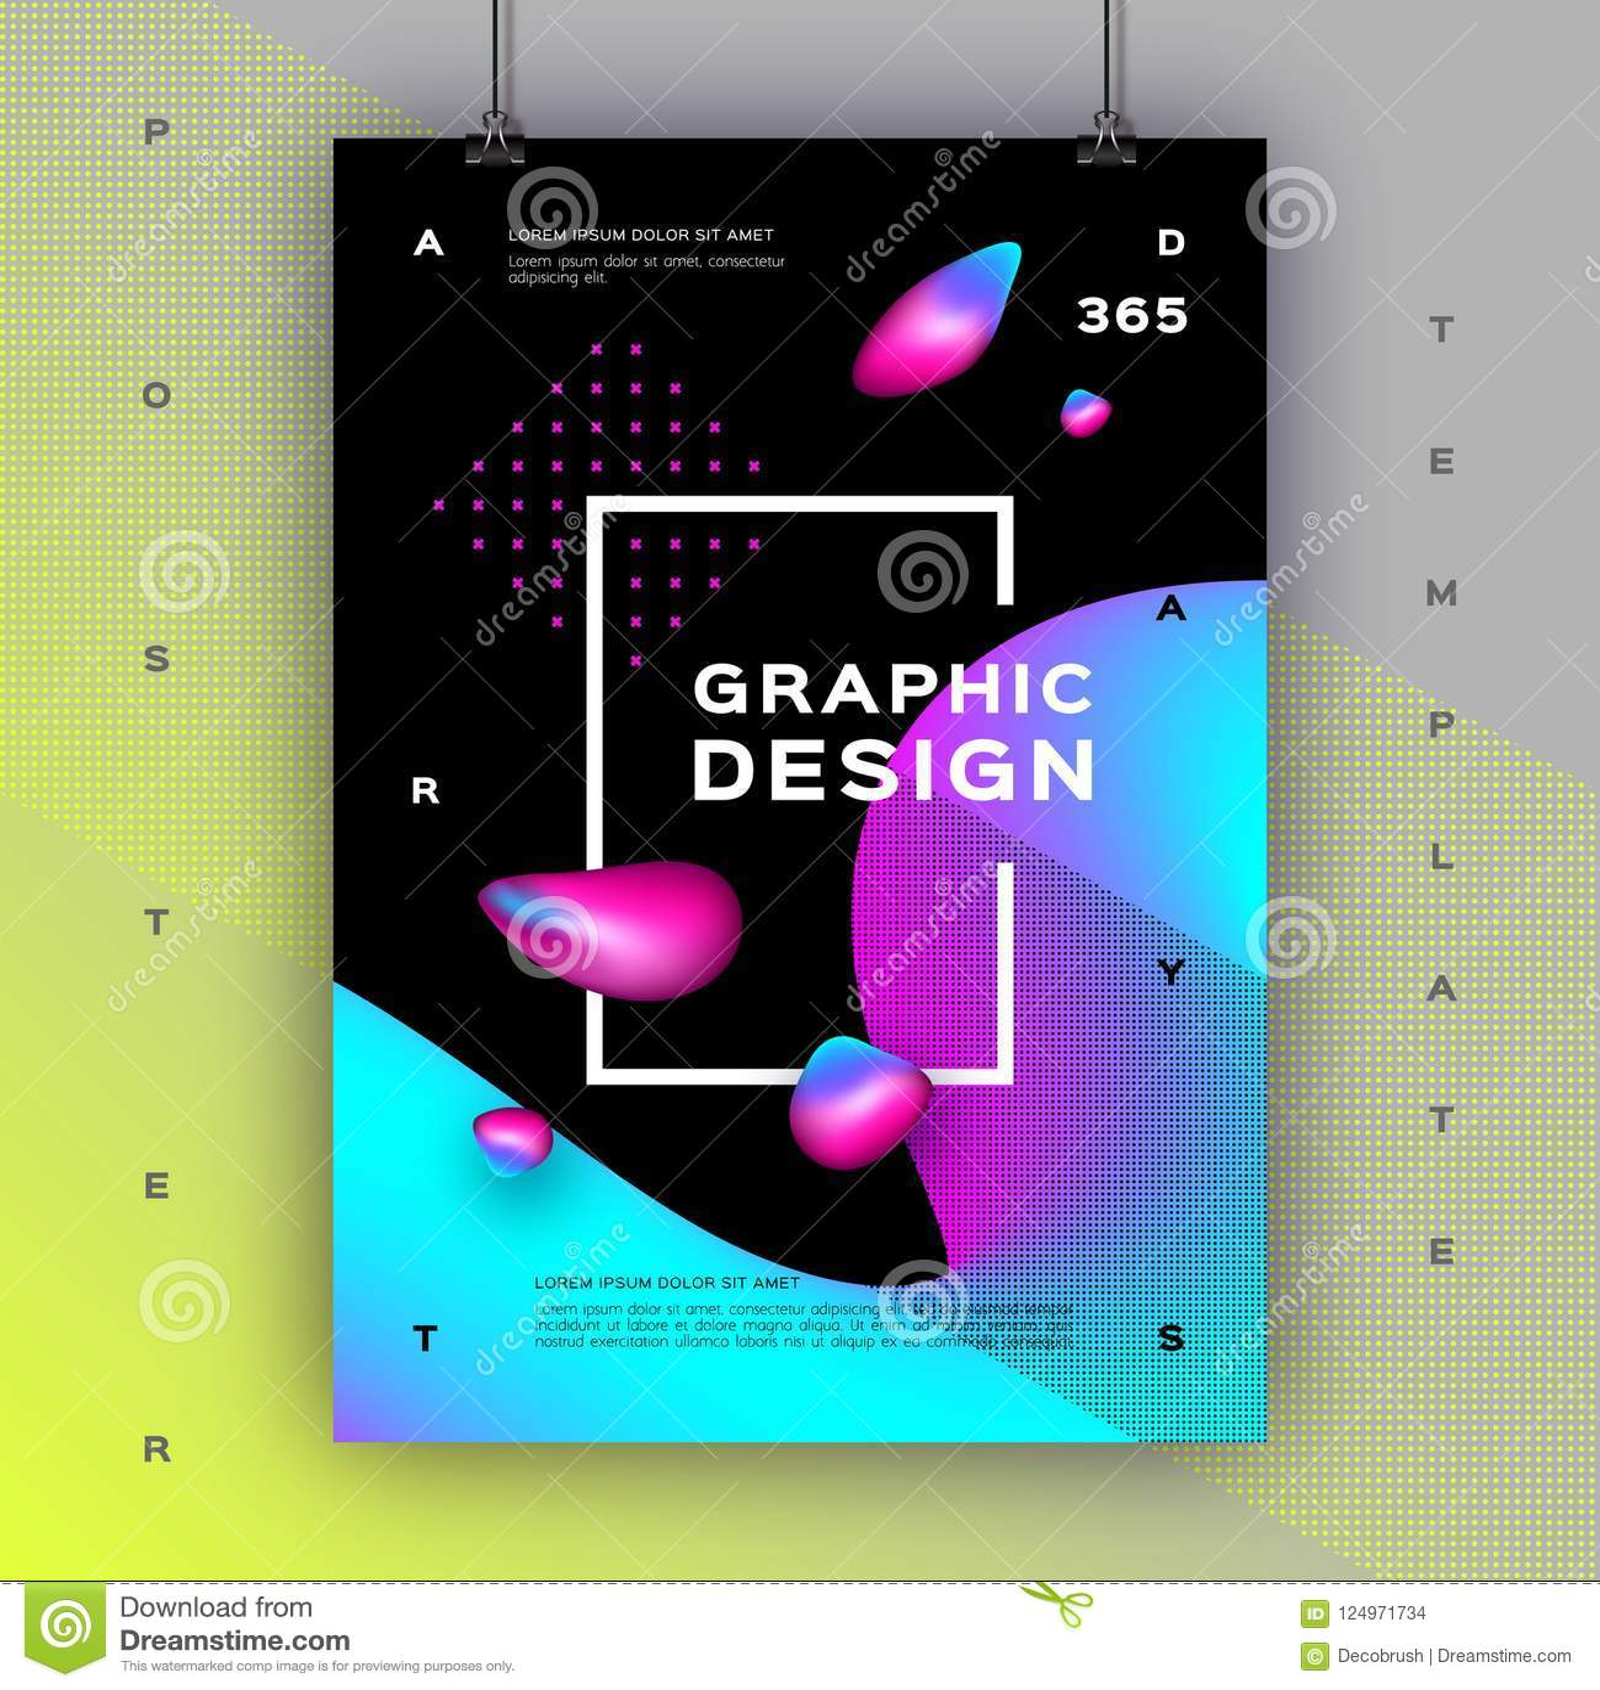 Trendy Poster Designs: Geometric Gradient Background, Trendy Graphic Design